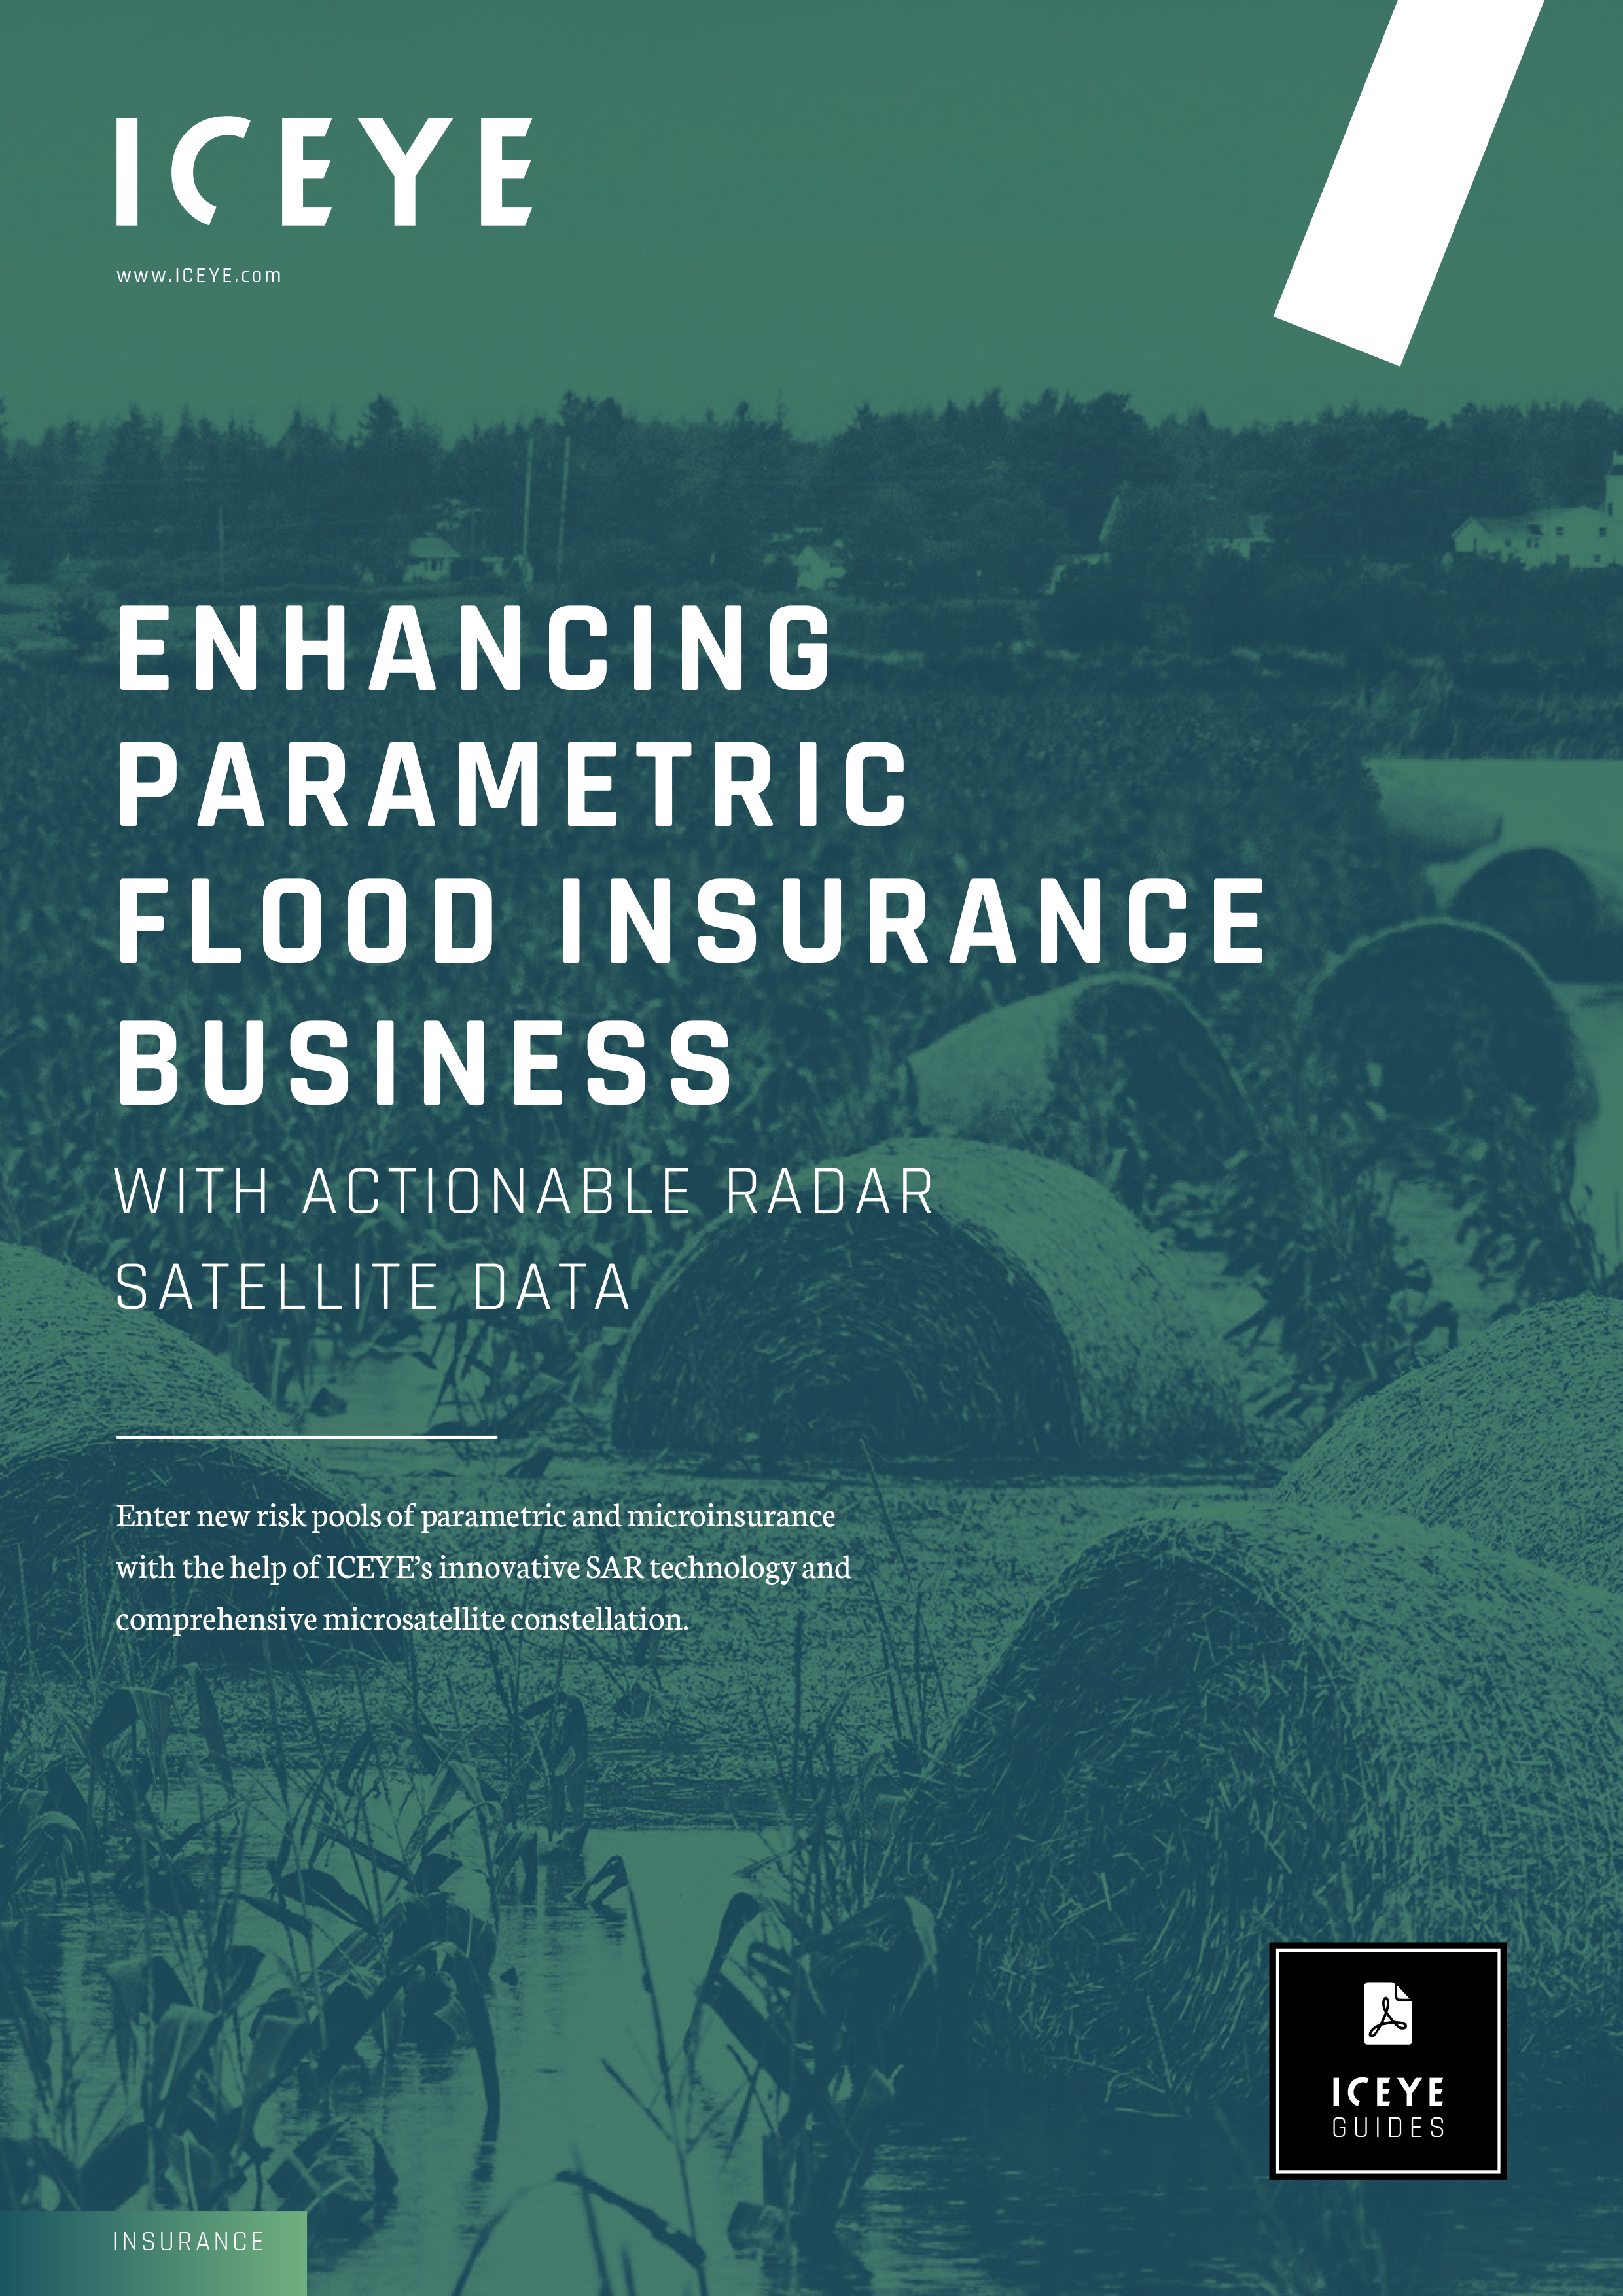 ICEYE-Enhancing-Parametric-Flood-Insurance-Guide-2018-1